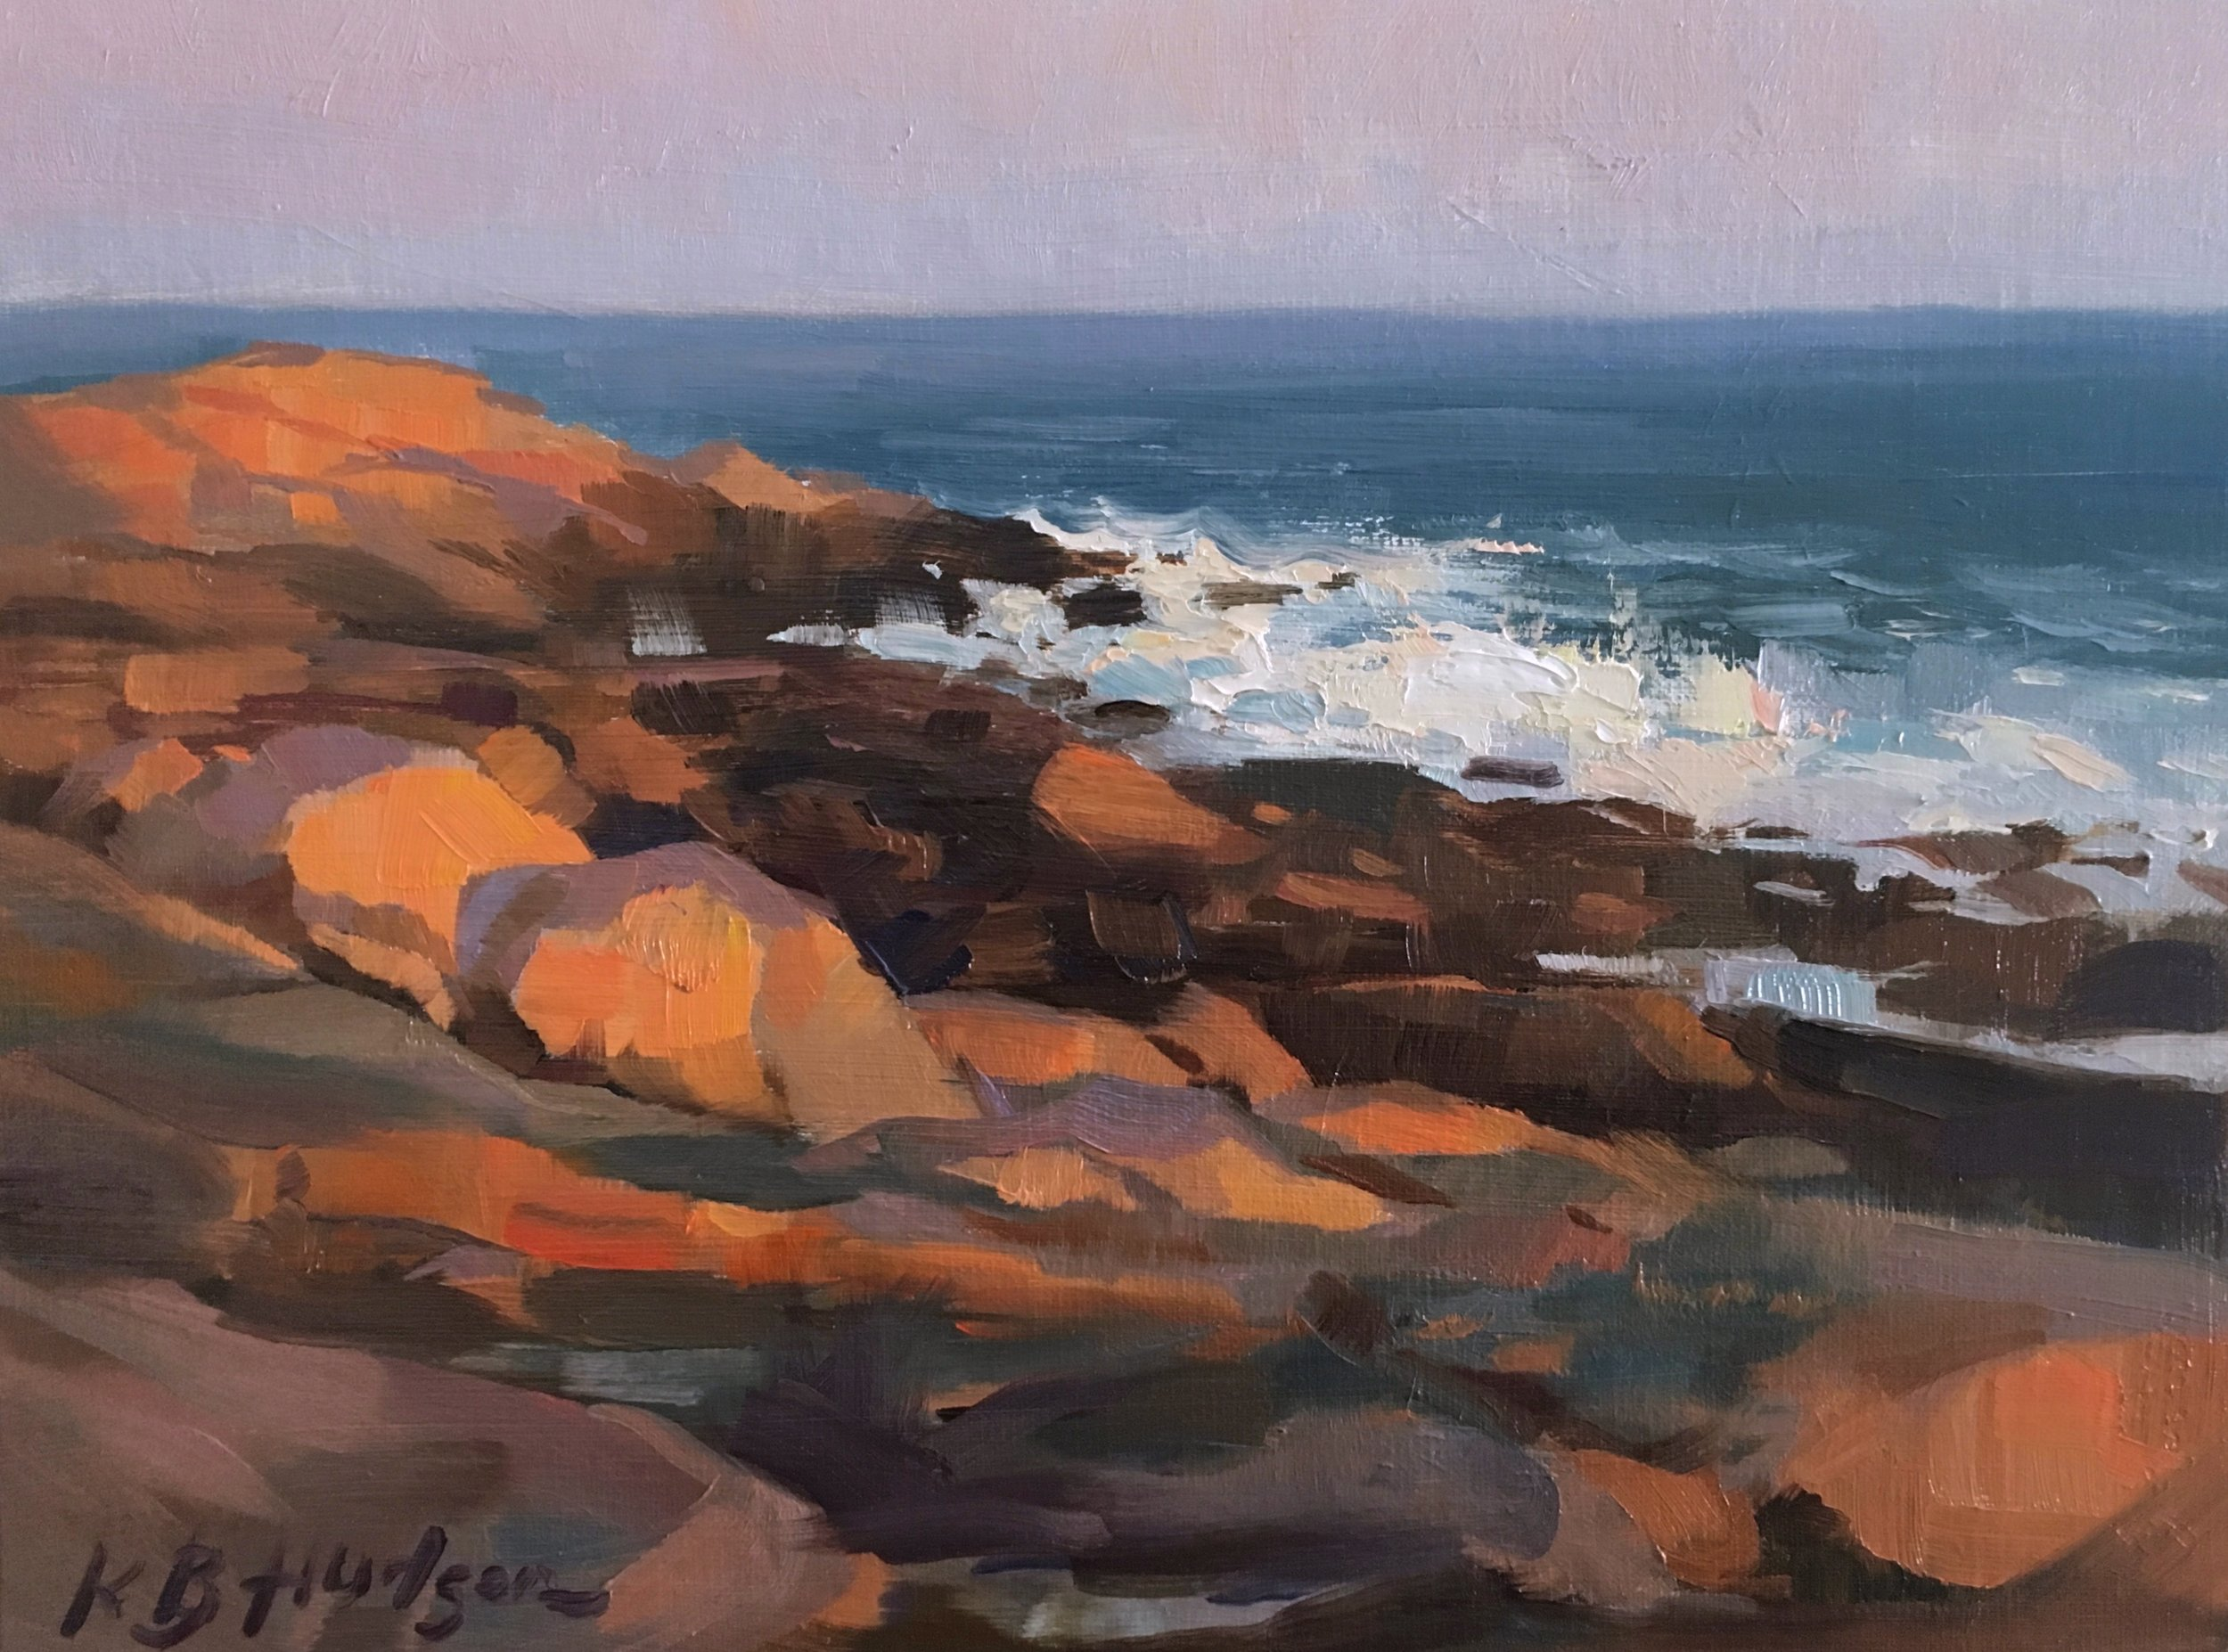 Hudson_Cape Ann Rocks.jpg